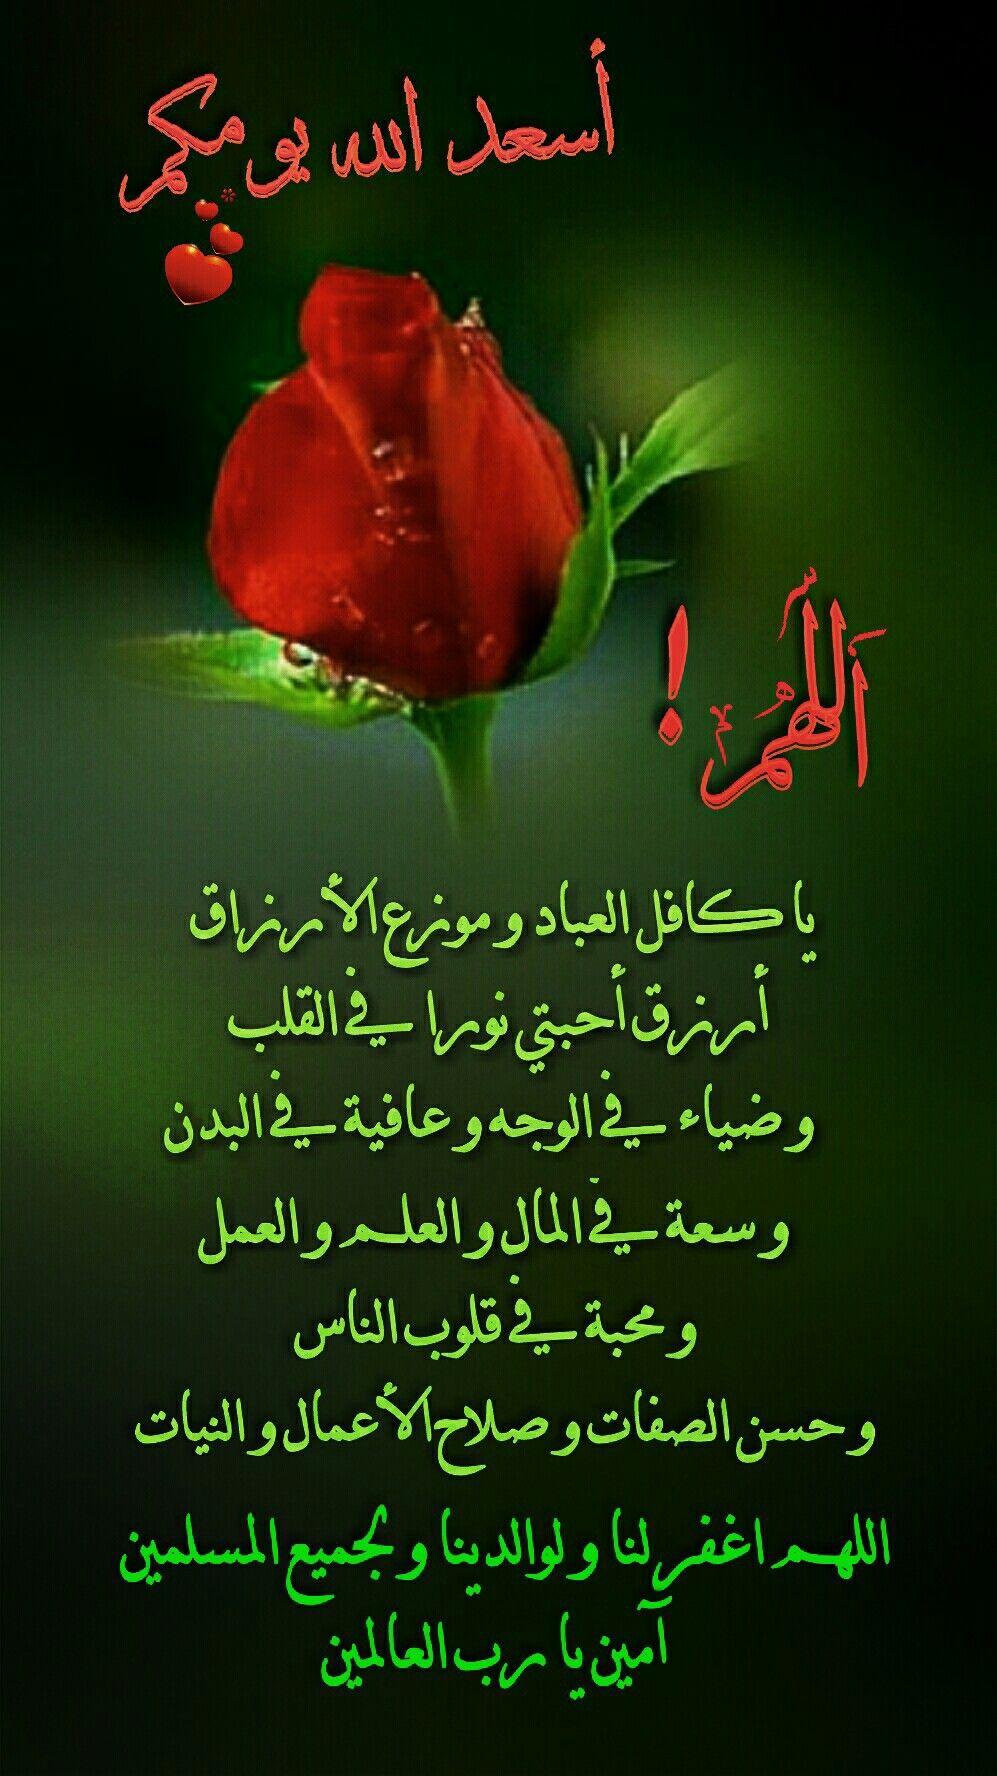 Epingle Par Ranya Anis Sur صباح الخير Citations Arabes Bonsoir